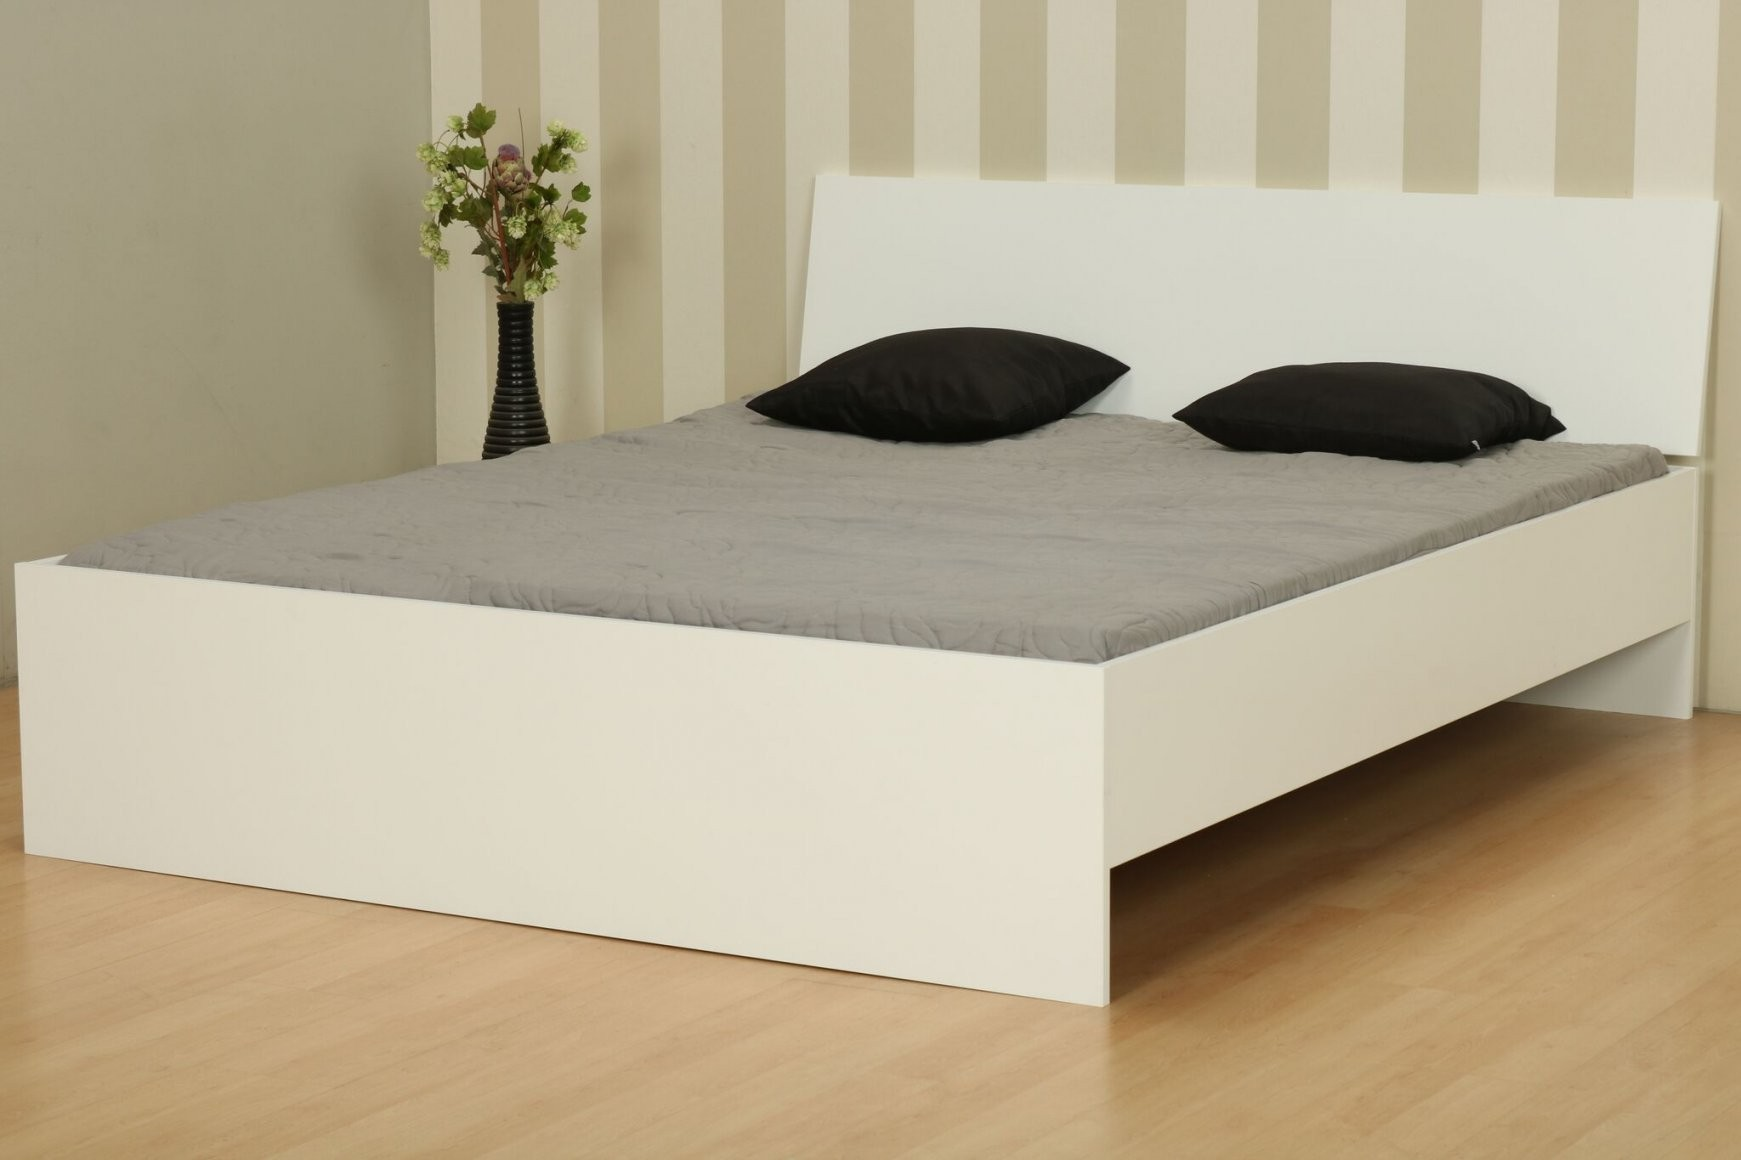 Doppelbett 160X200 Cm Ehebett Holz Bett Bettgestell Bettrahmen von Bettgestell 160X200 Holz Photo